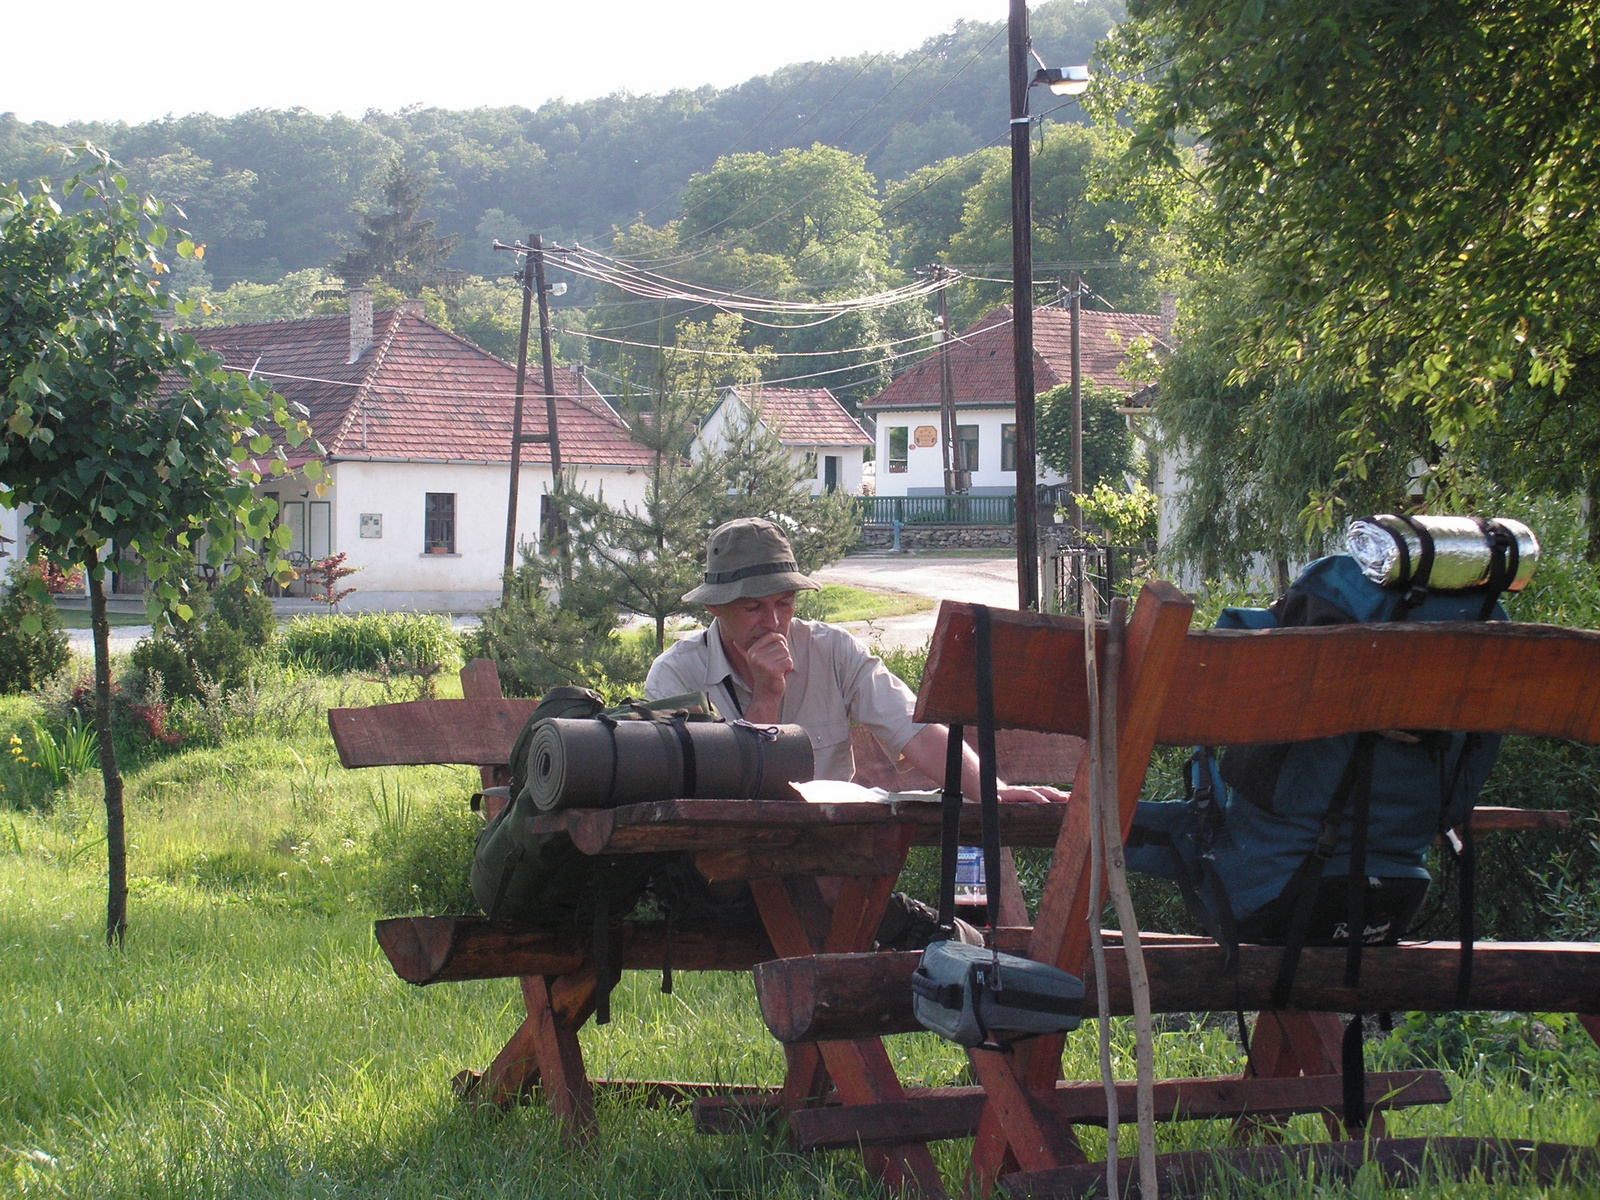 442 Pihenő Irota falu központjában